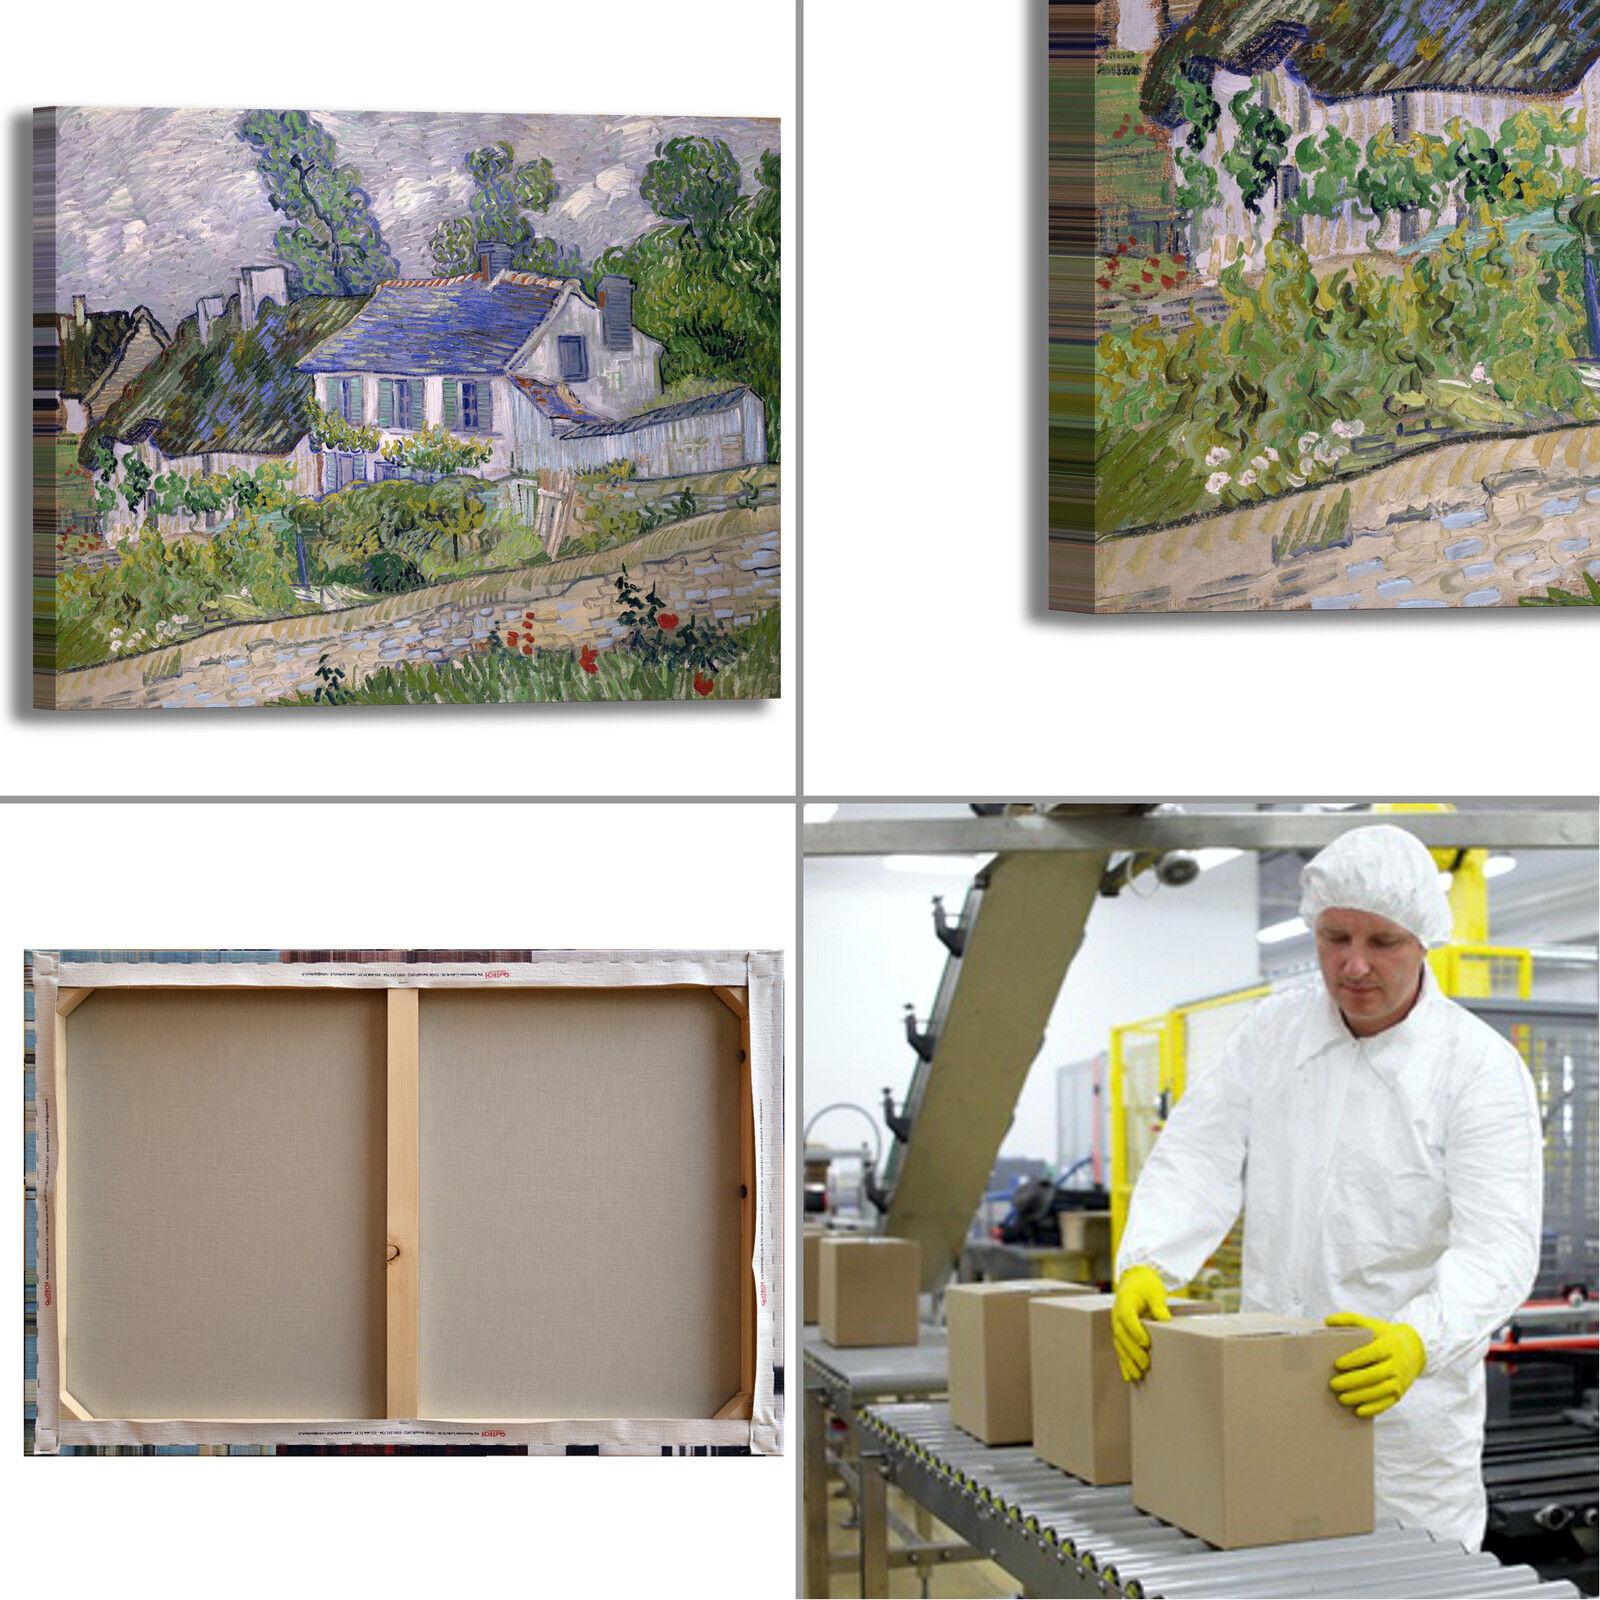 Van Gogh casa ad Anversa design quadro stampa dipinto tela dipinto stampa telaio arRouge o casa 2f474d